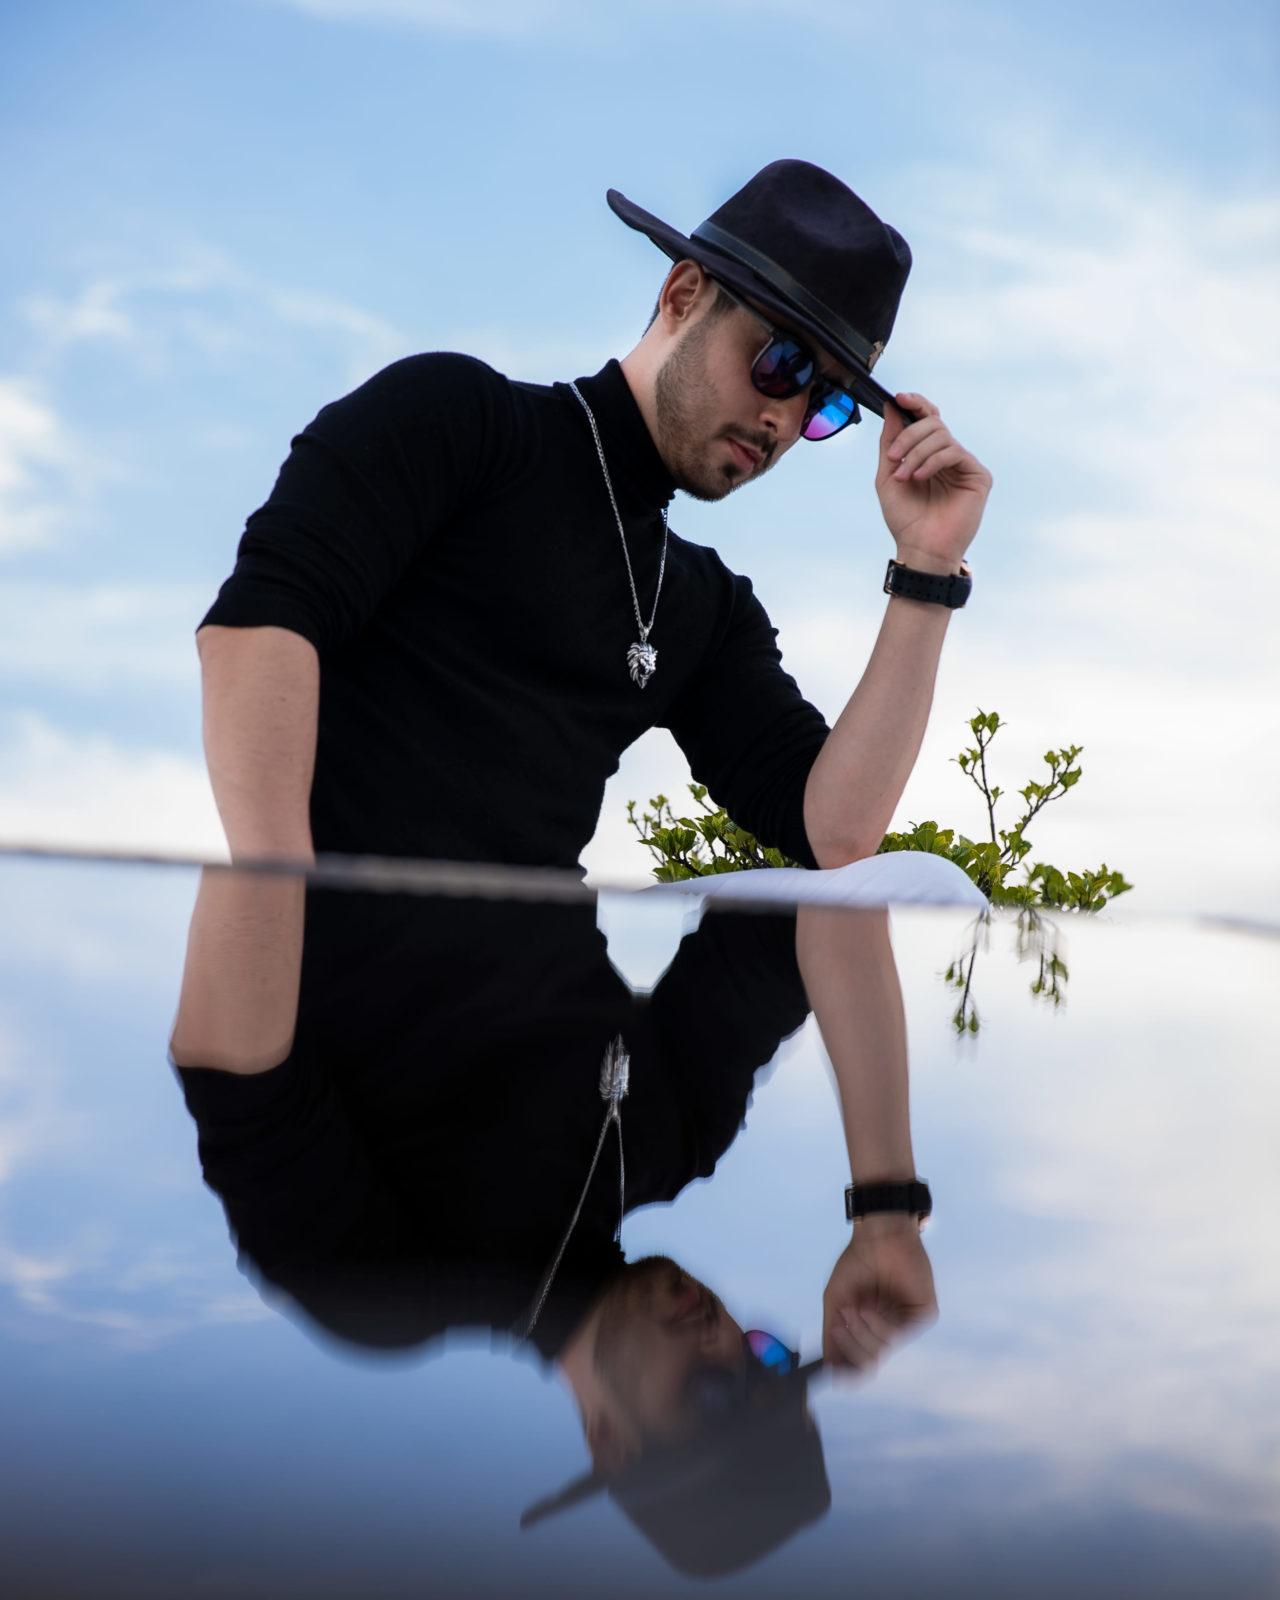 Foto-10-Sebastian-Castro-Musica-Musica-Sebastian_Castro-Pop-Urbana-Mexico-2020-Influencer-Artista-Cantante-Singer